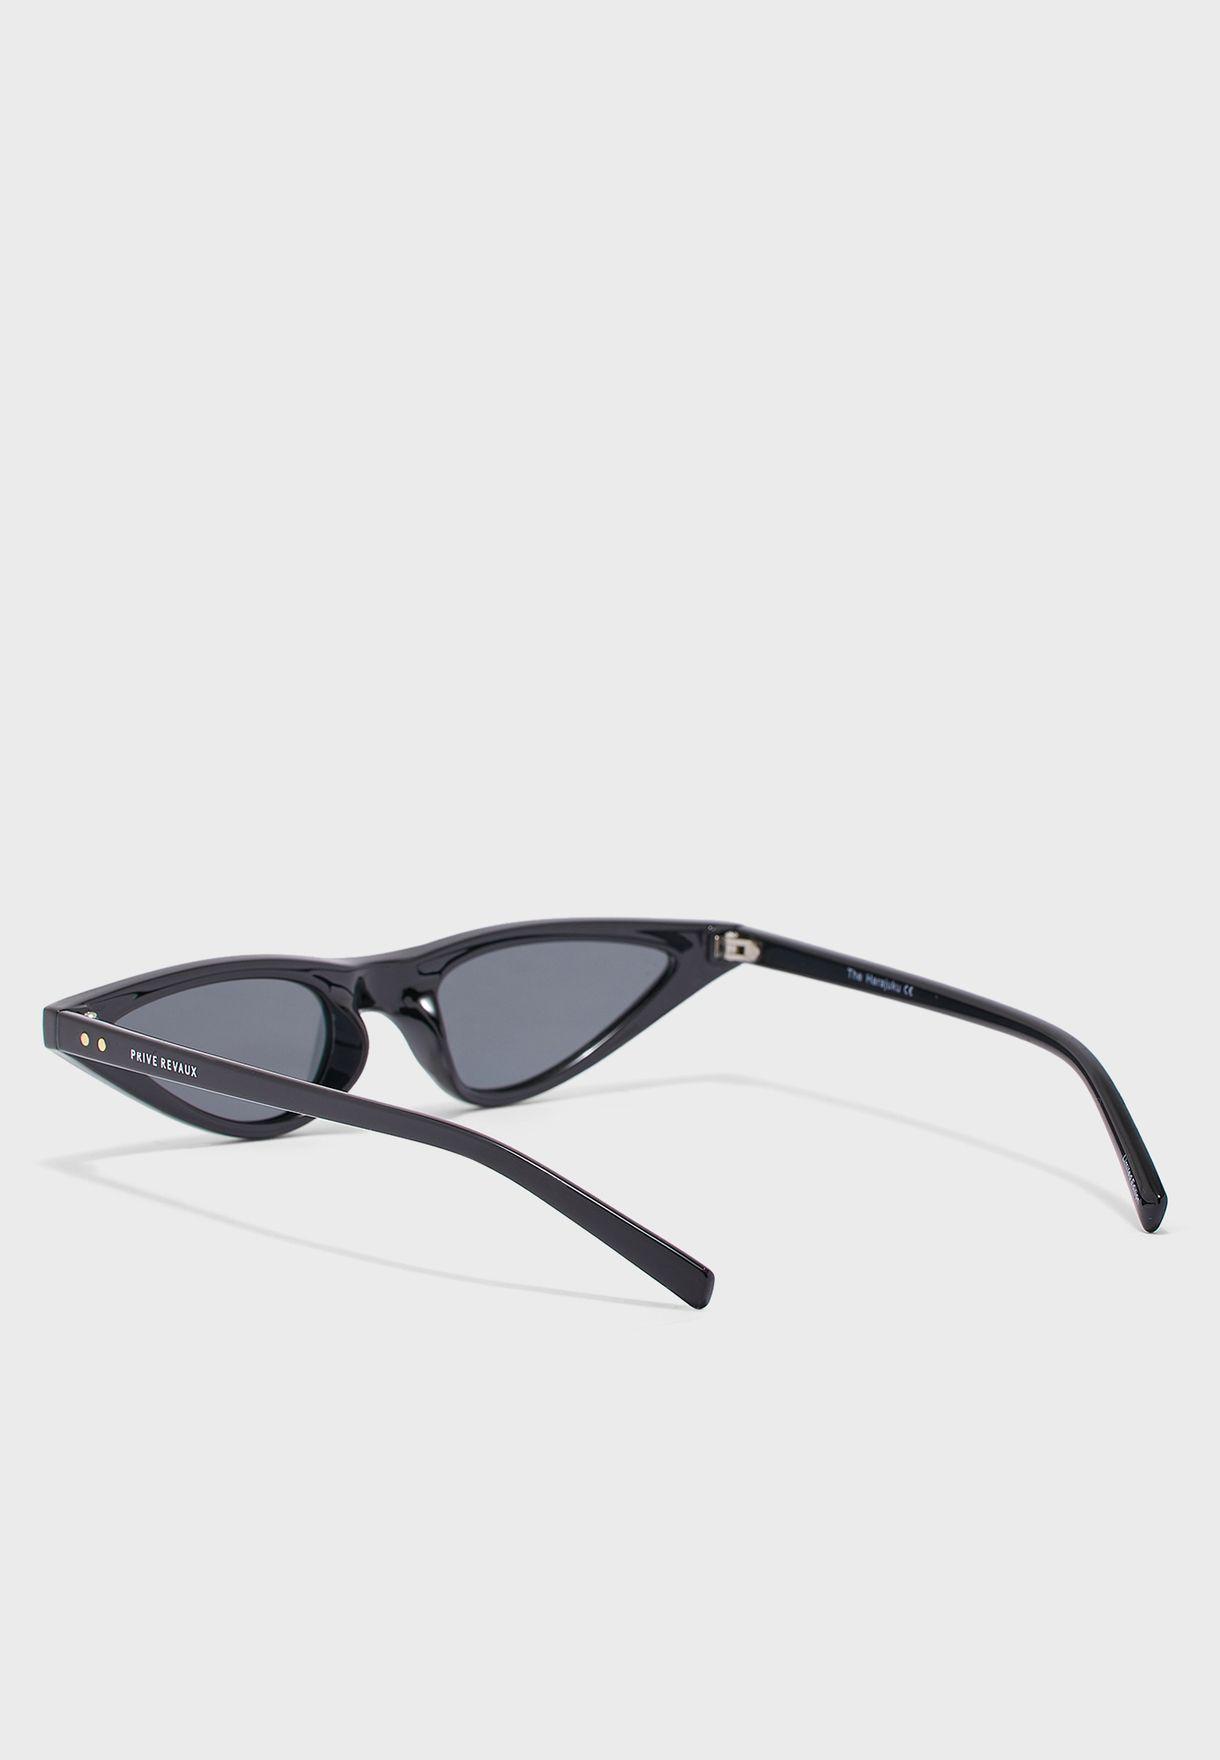 The Harajuku Cat Eye Sunglasses